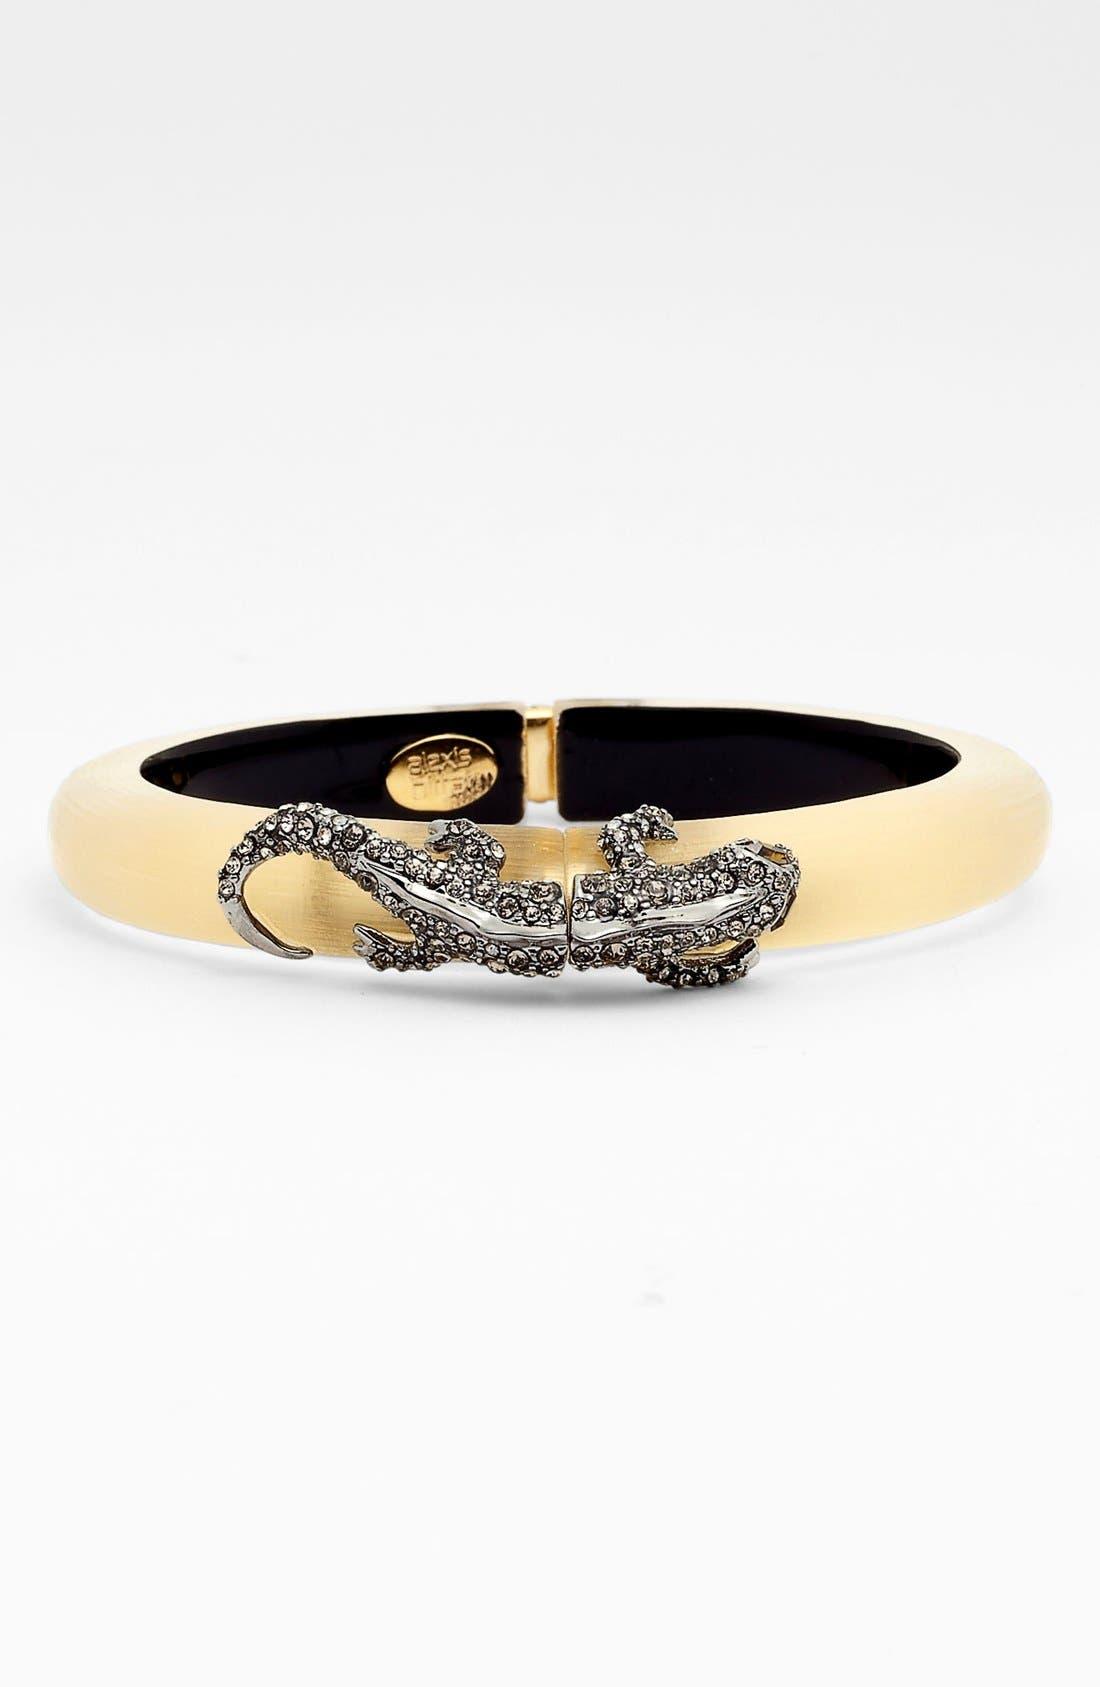 Main Image - Alexis Bittar 'Lucite® - Durban' Salamander Hinged Bracelet